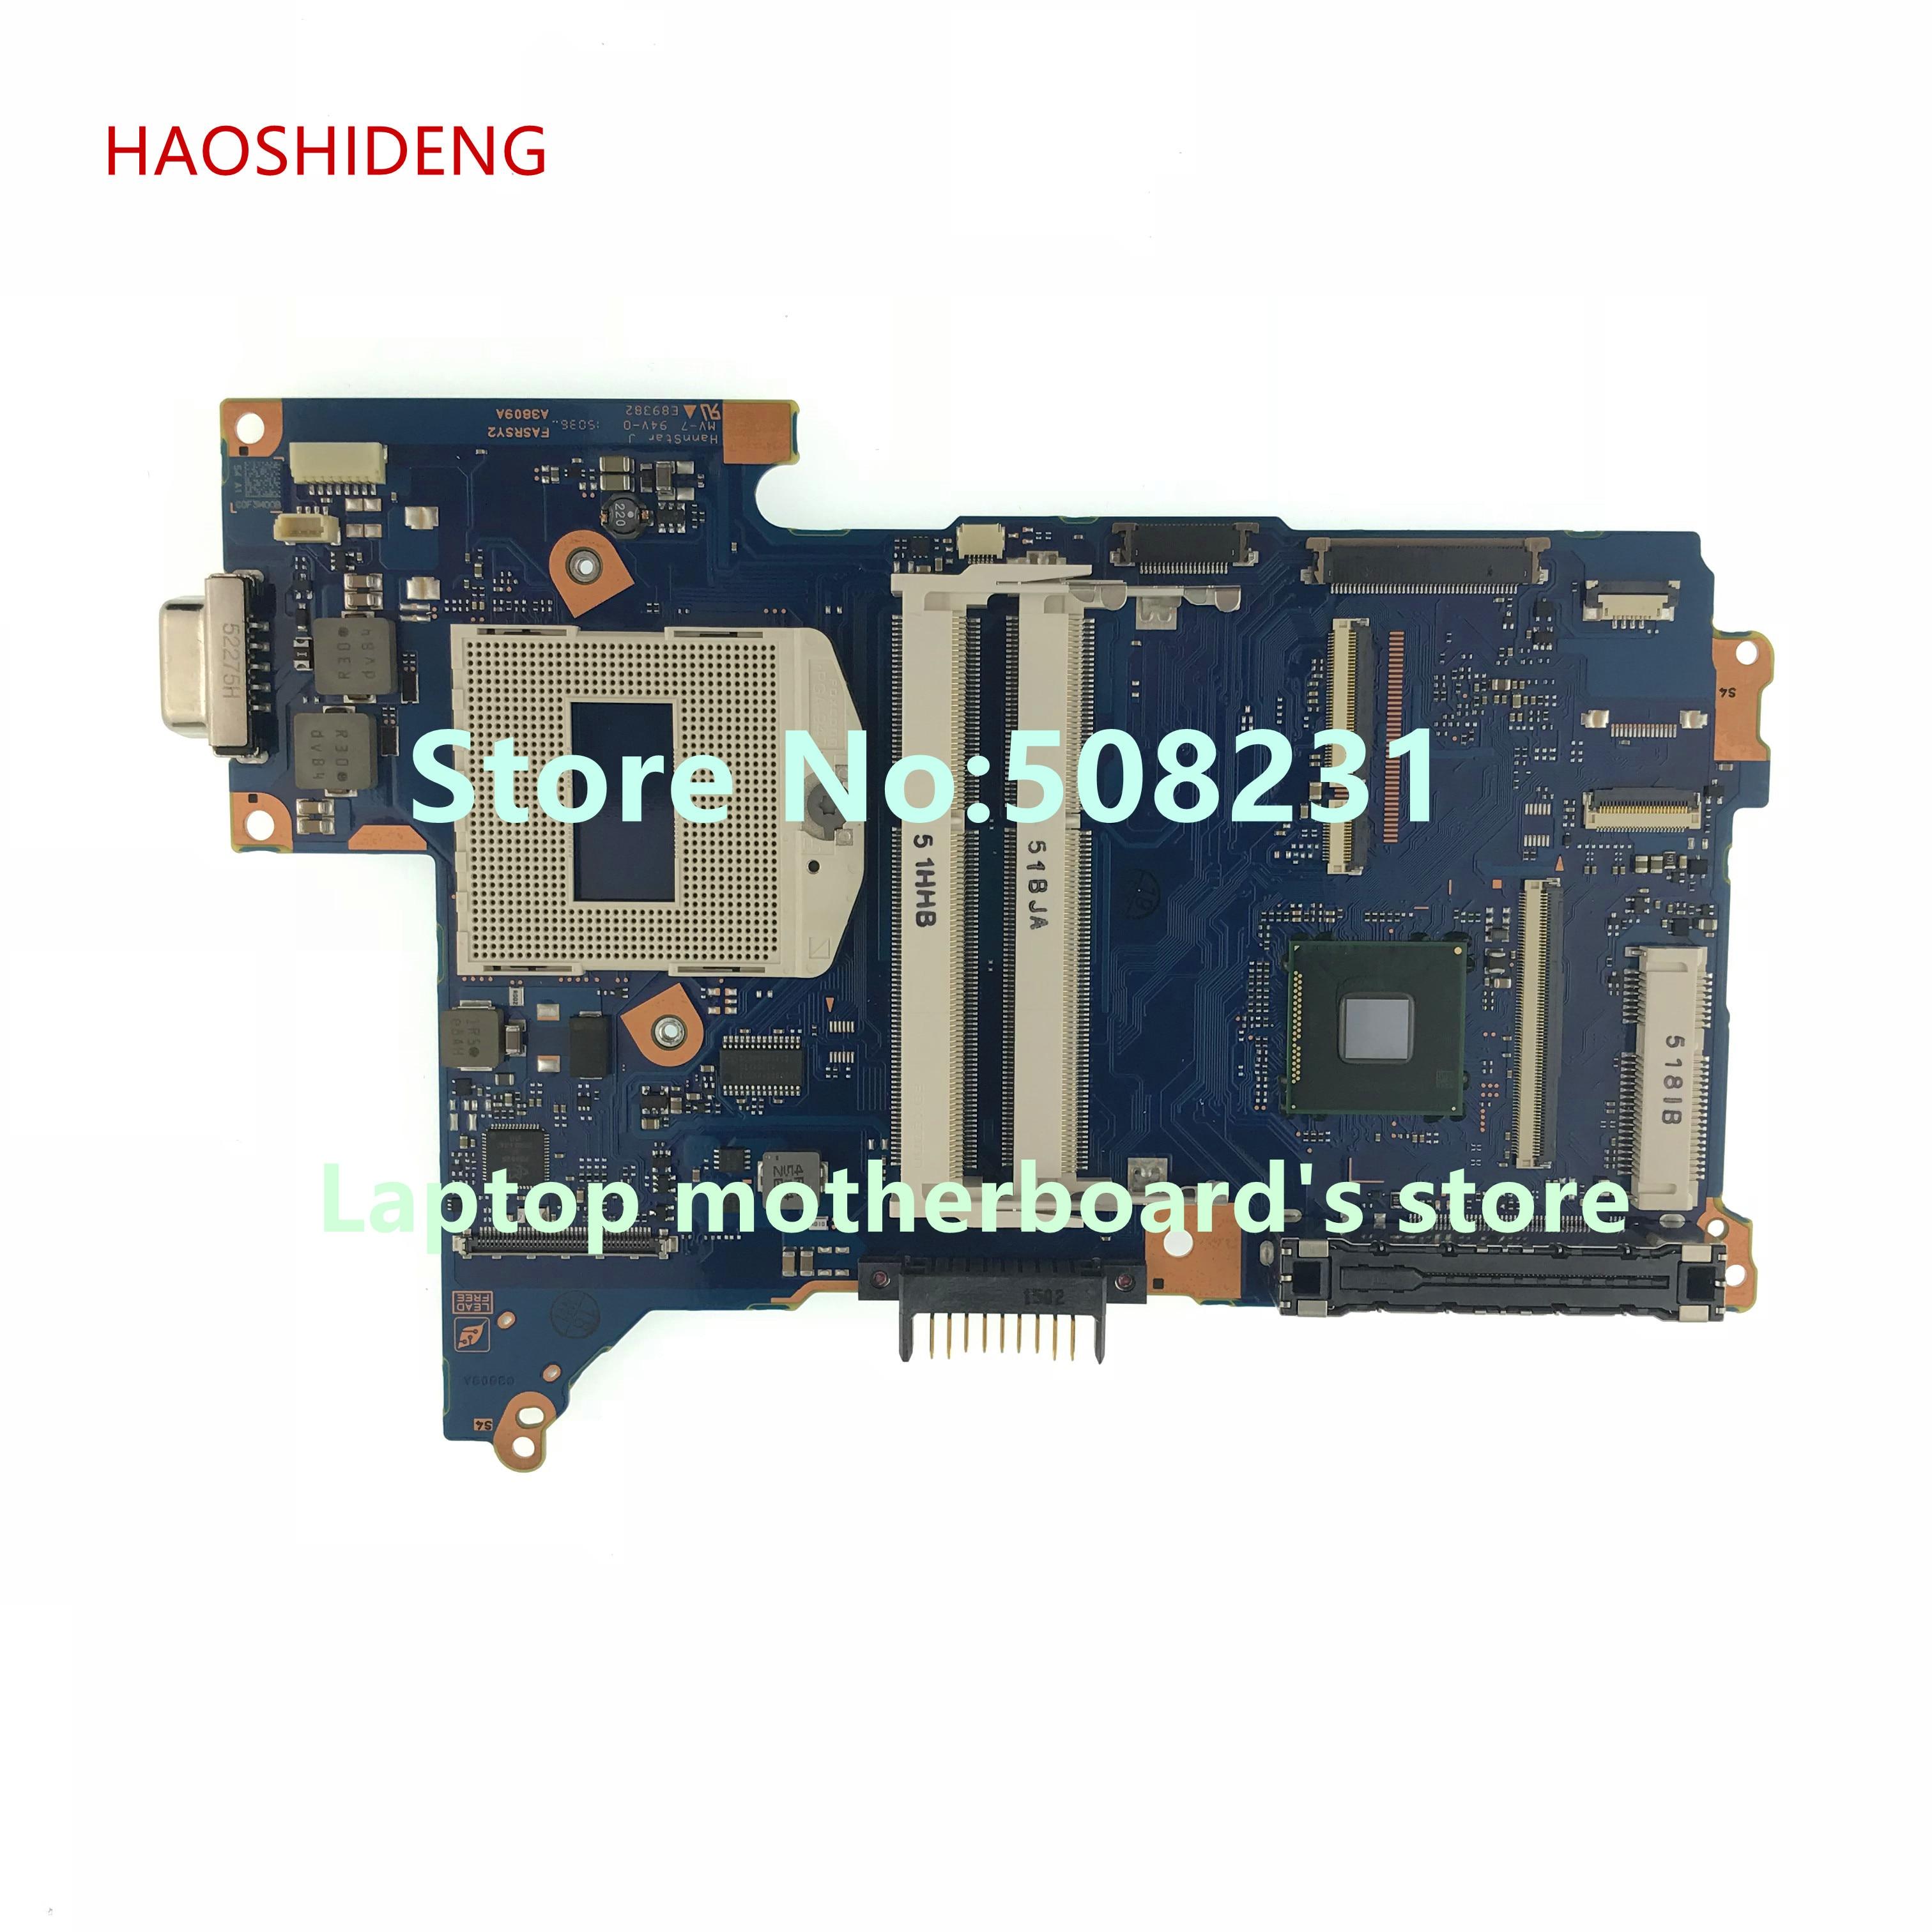 купить HAOSHIDENG FASRSY2 mainboard For Toshiba Portege R30 R30-A laptop motherboard A3809A socket PGA 947 онлайн